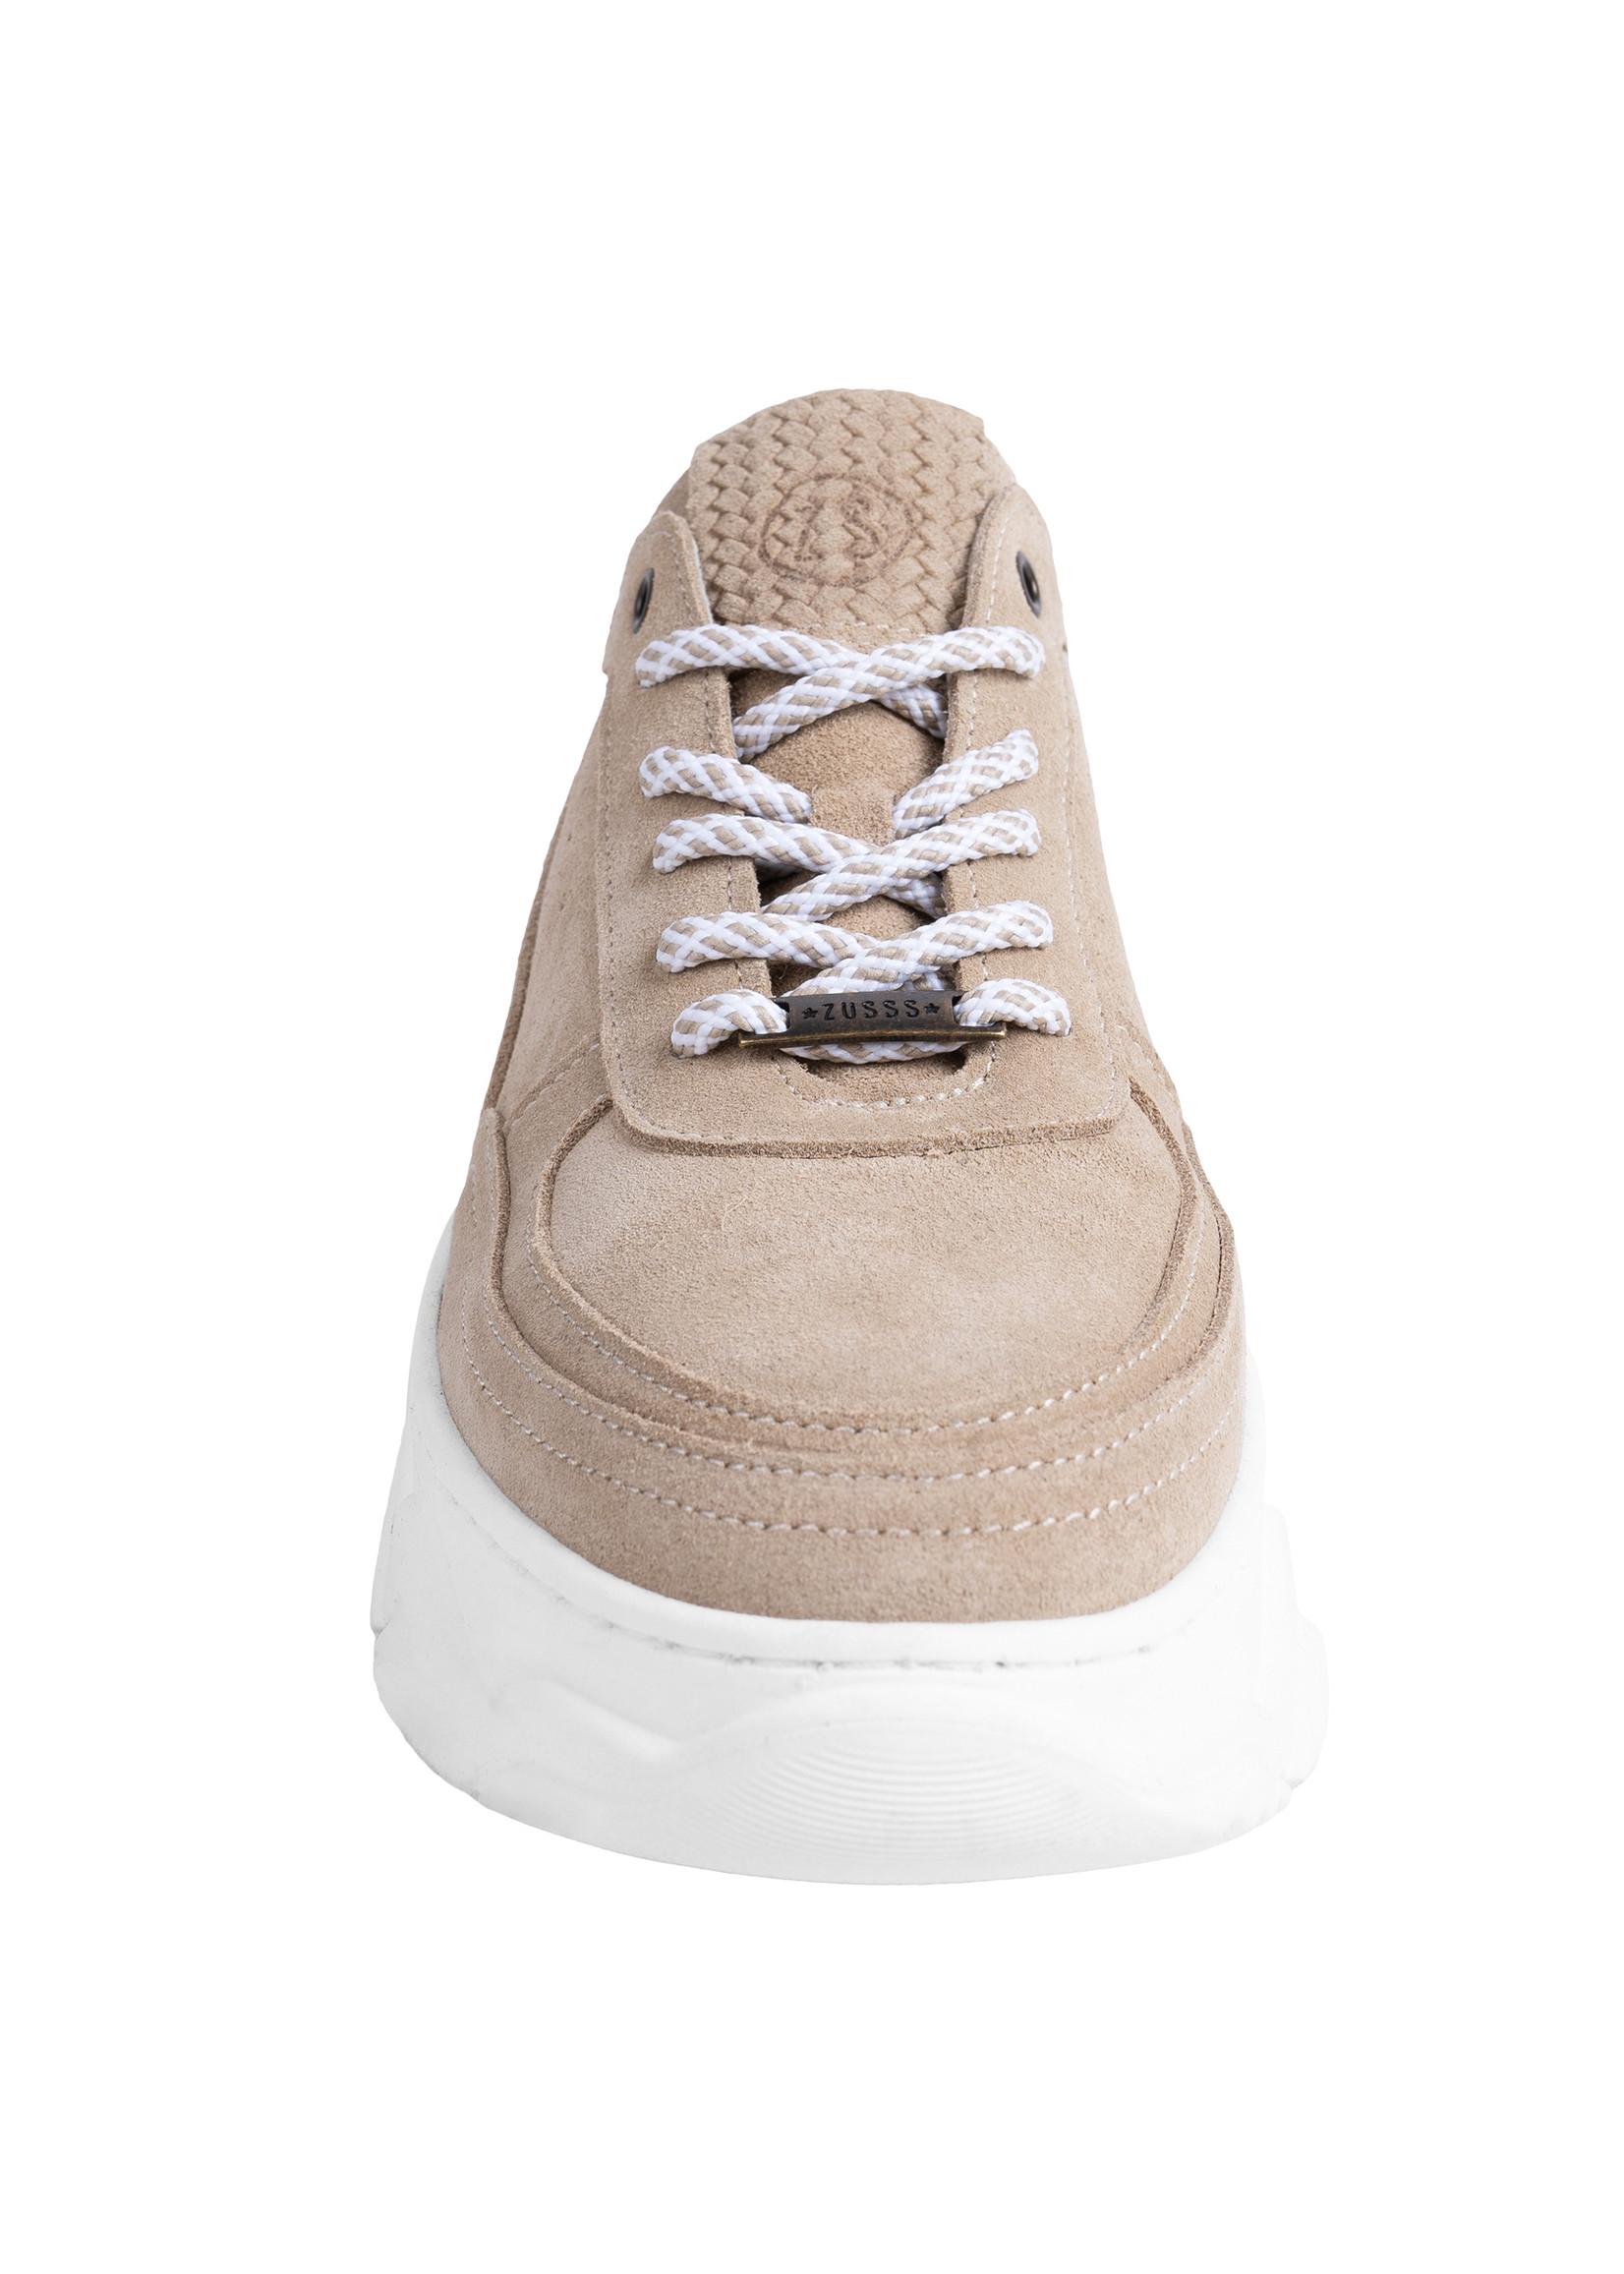 ZUSSS Gave sneaker zand